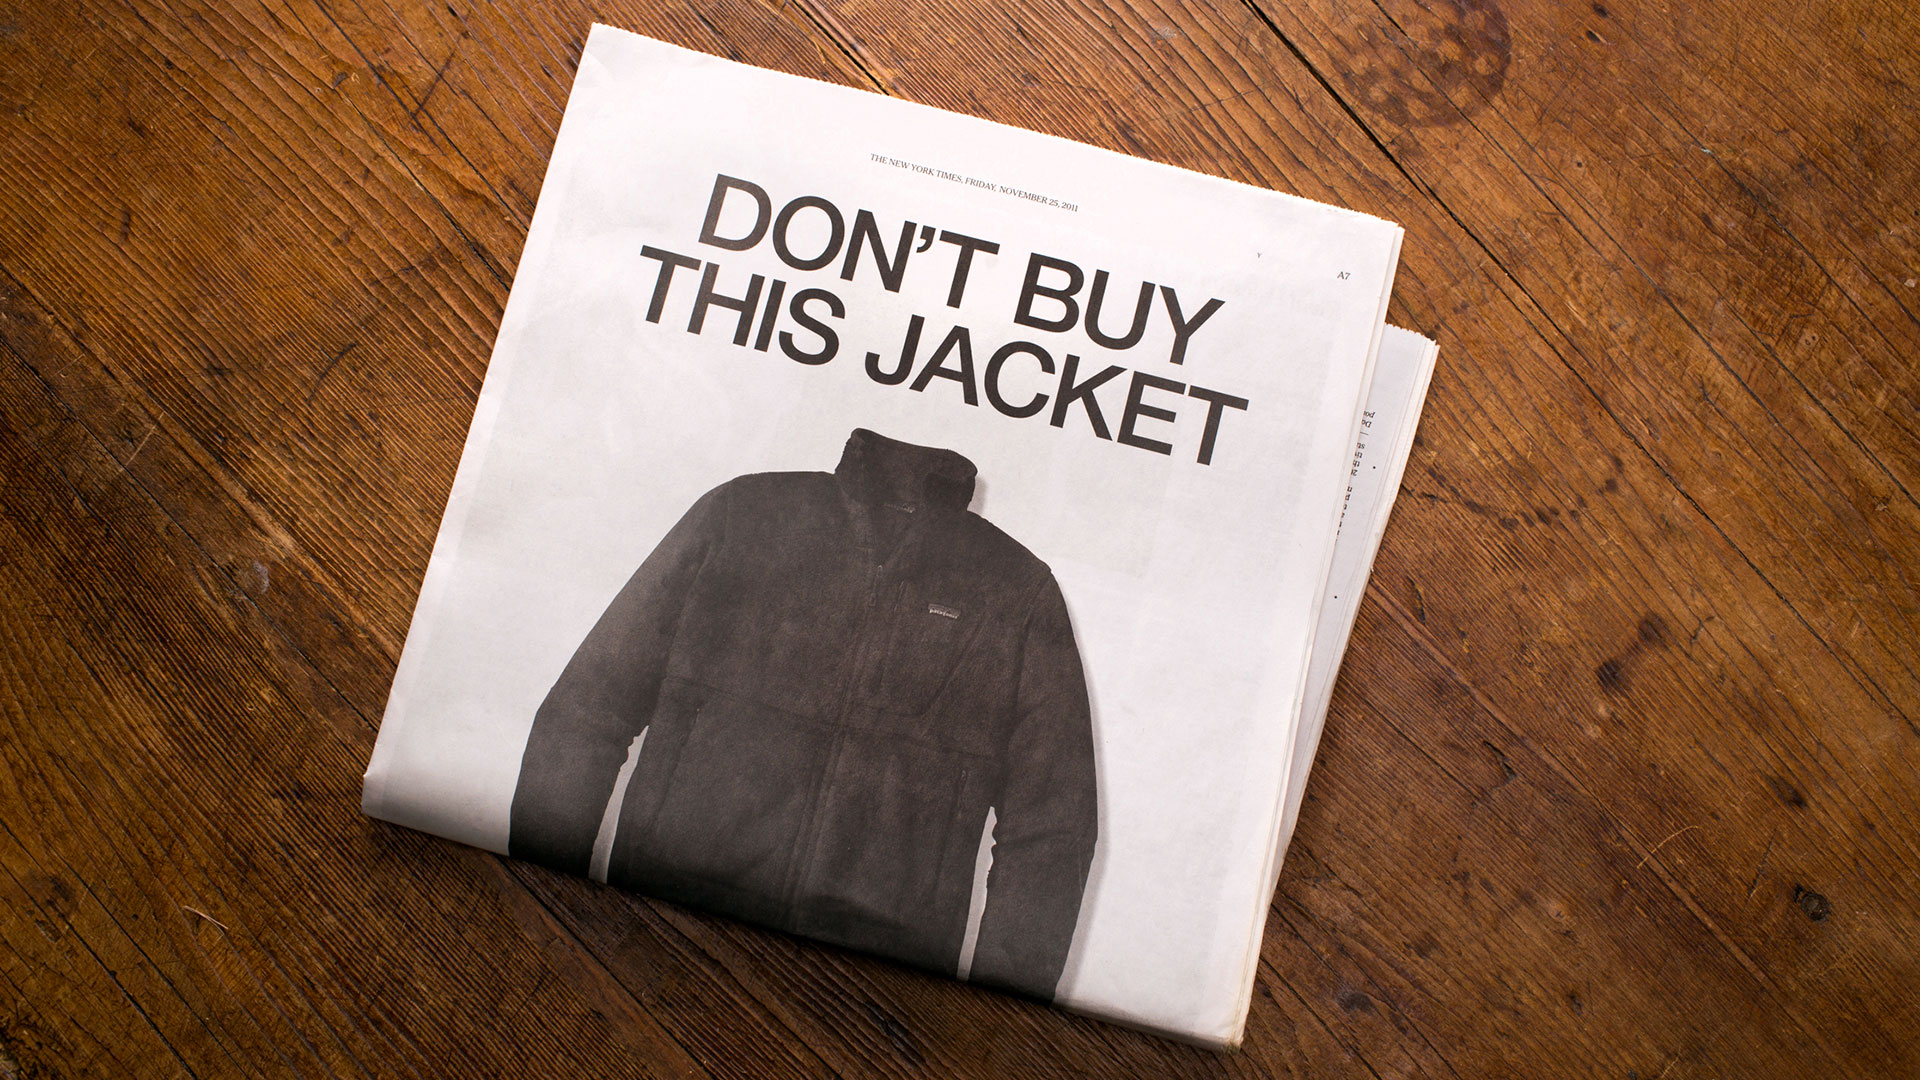 Patagonia Black Friday Ad: Don't Buy This Jacket